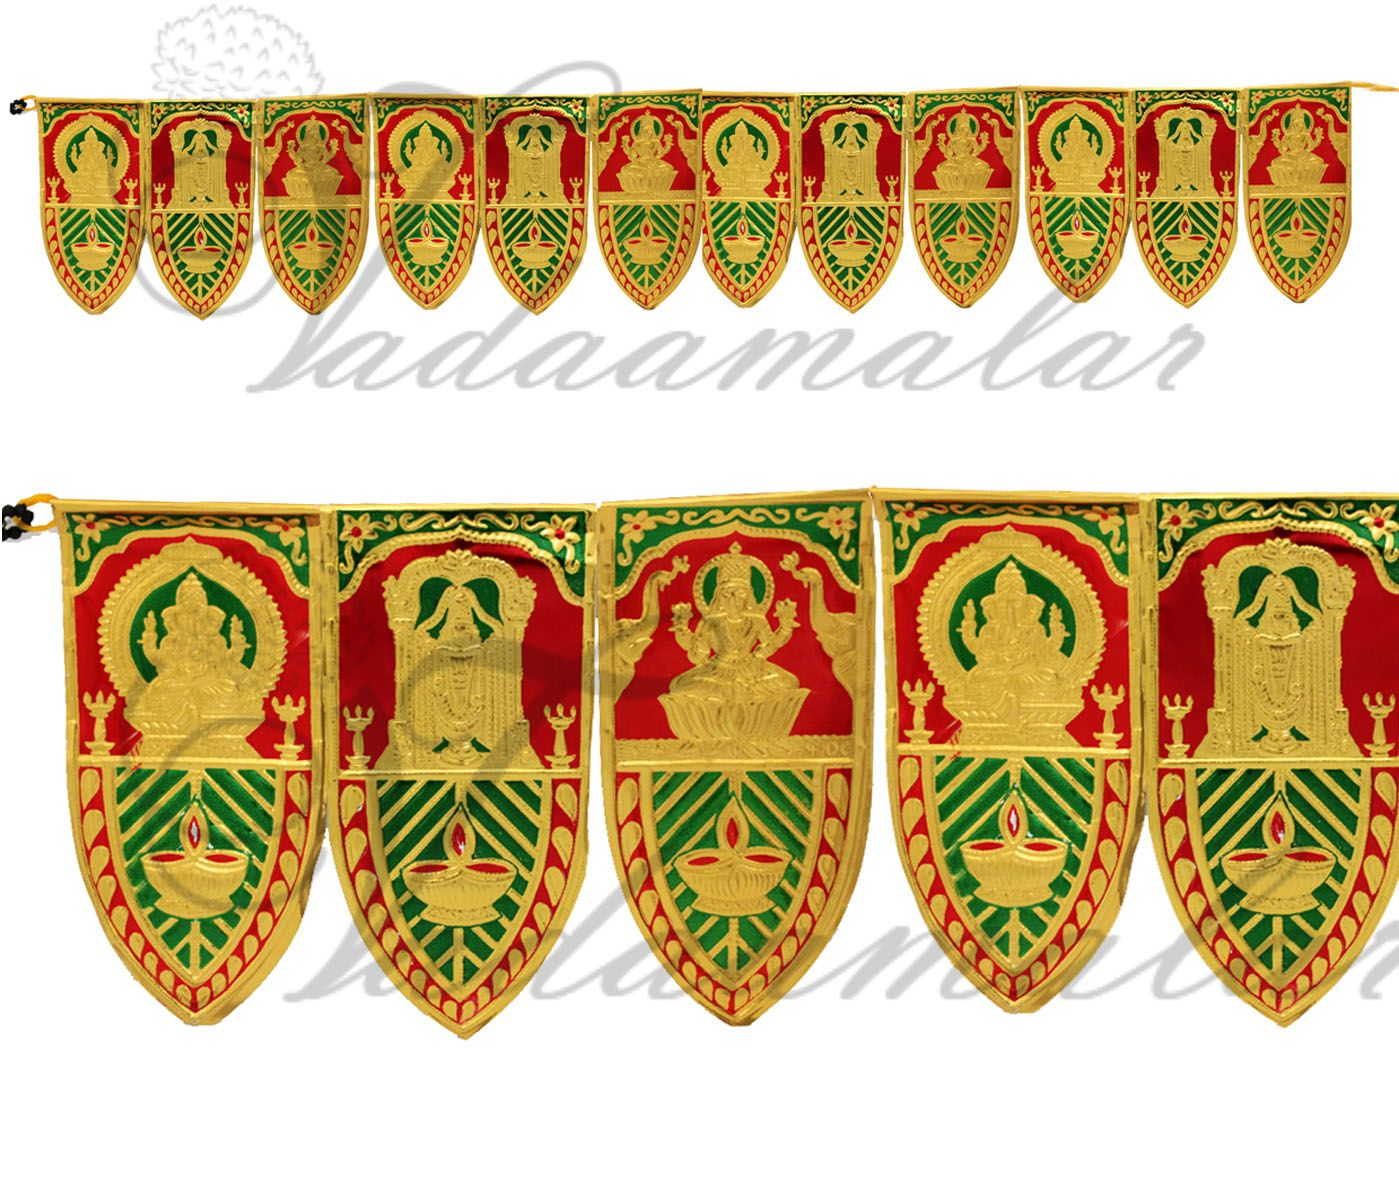 5 meters Mango Leaf Design Deities India Toran Tapestry Doorway ... for Indian Hanging Decorations  104xkb